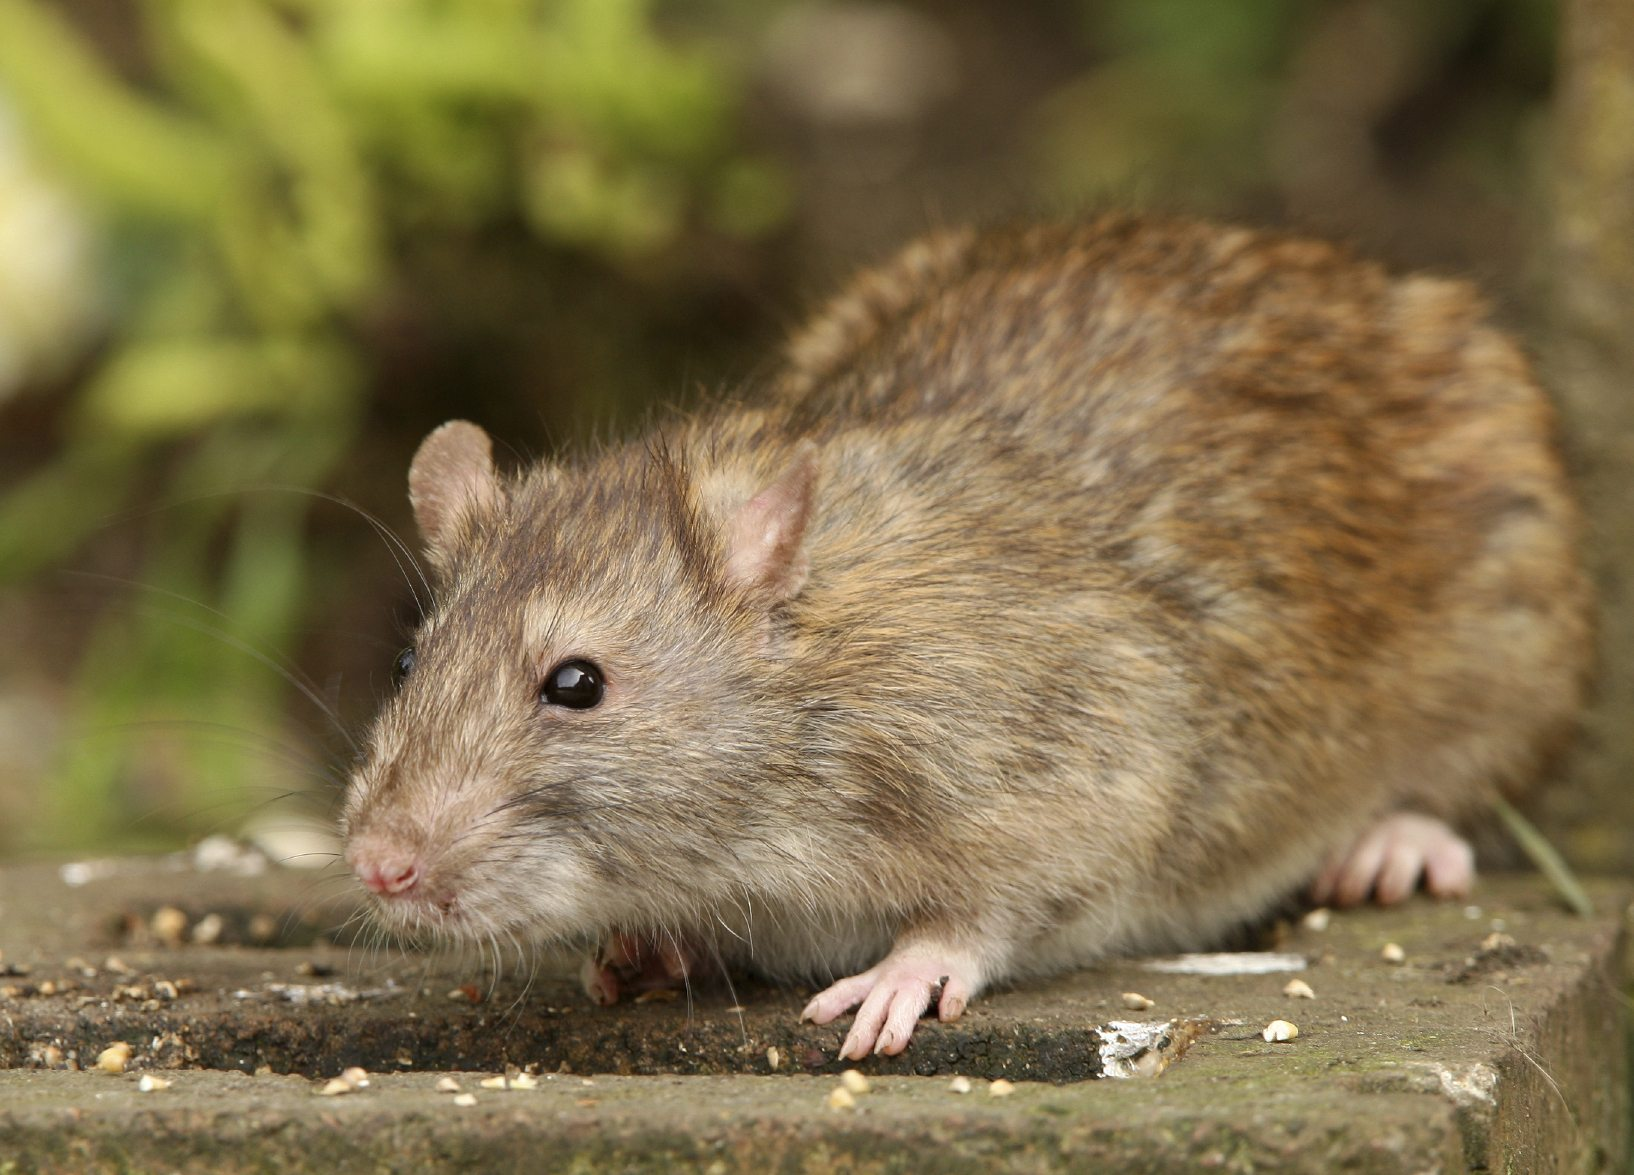 Rats In A City Garden Information About Urban Gardening